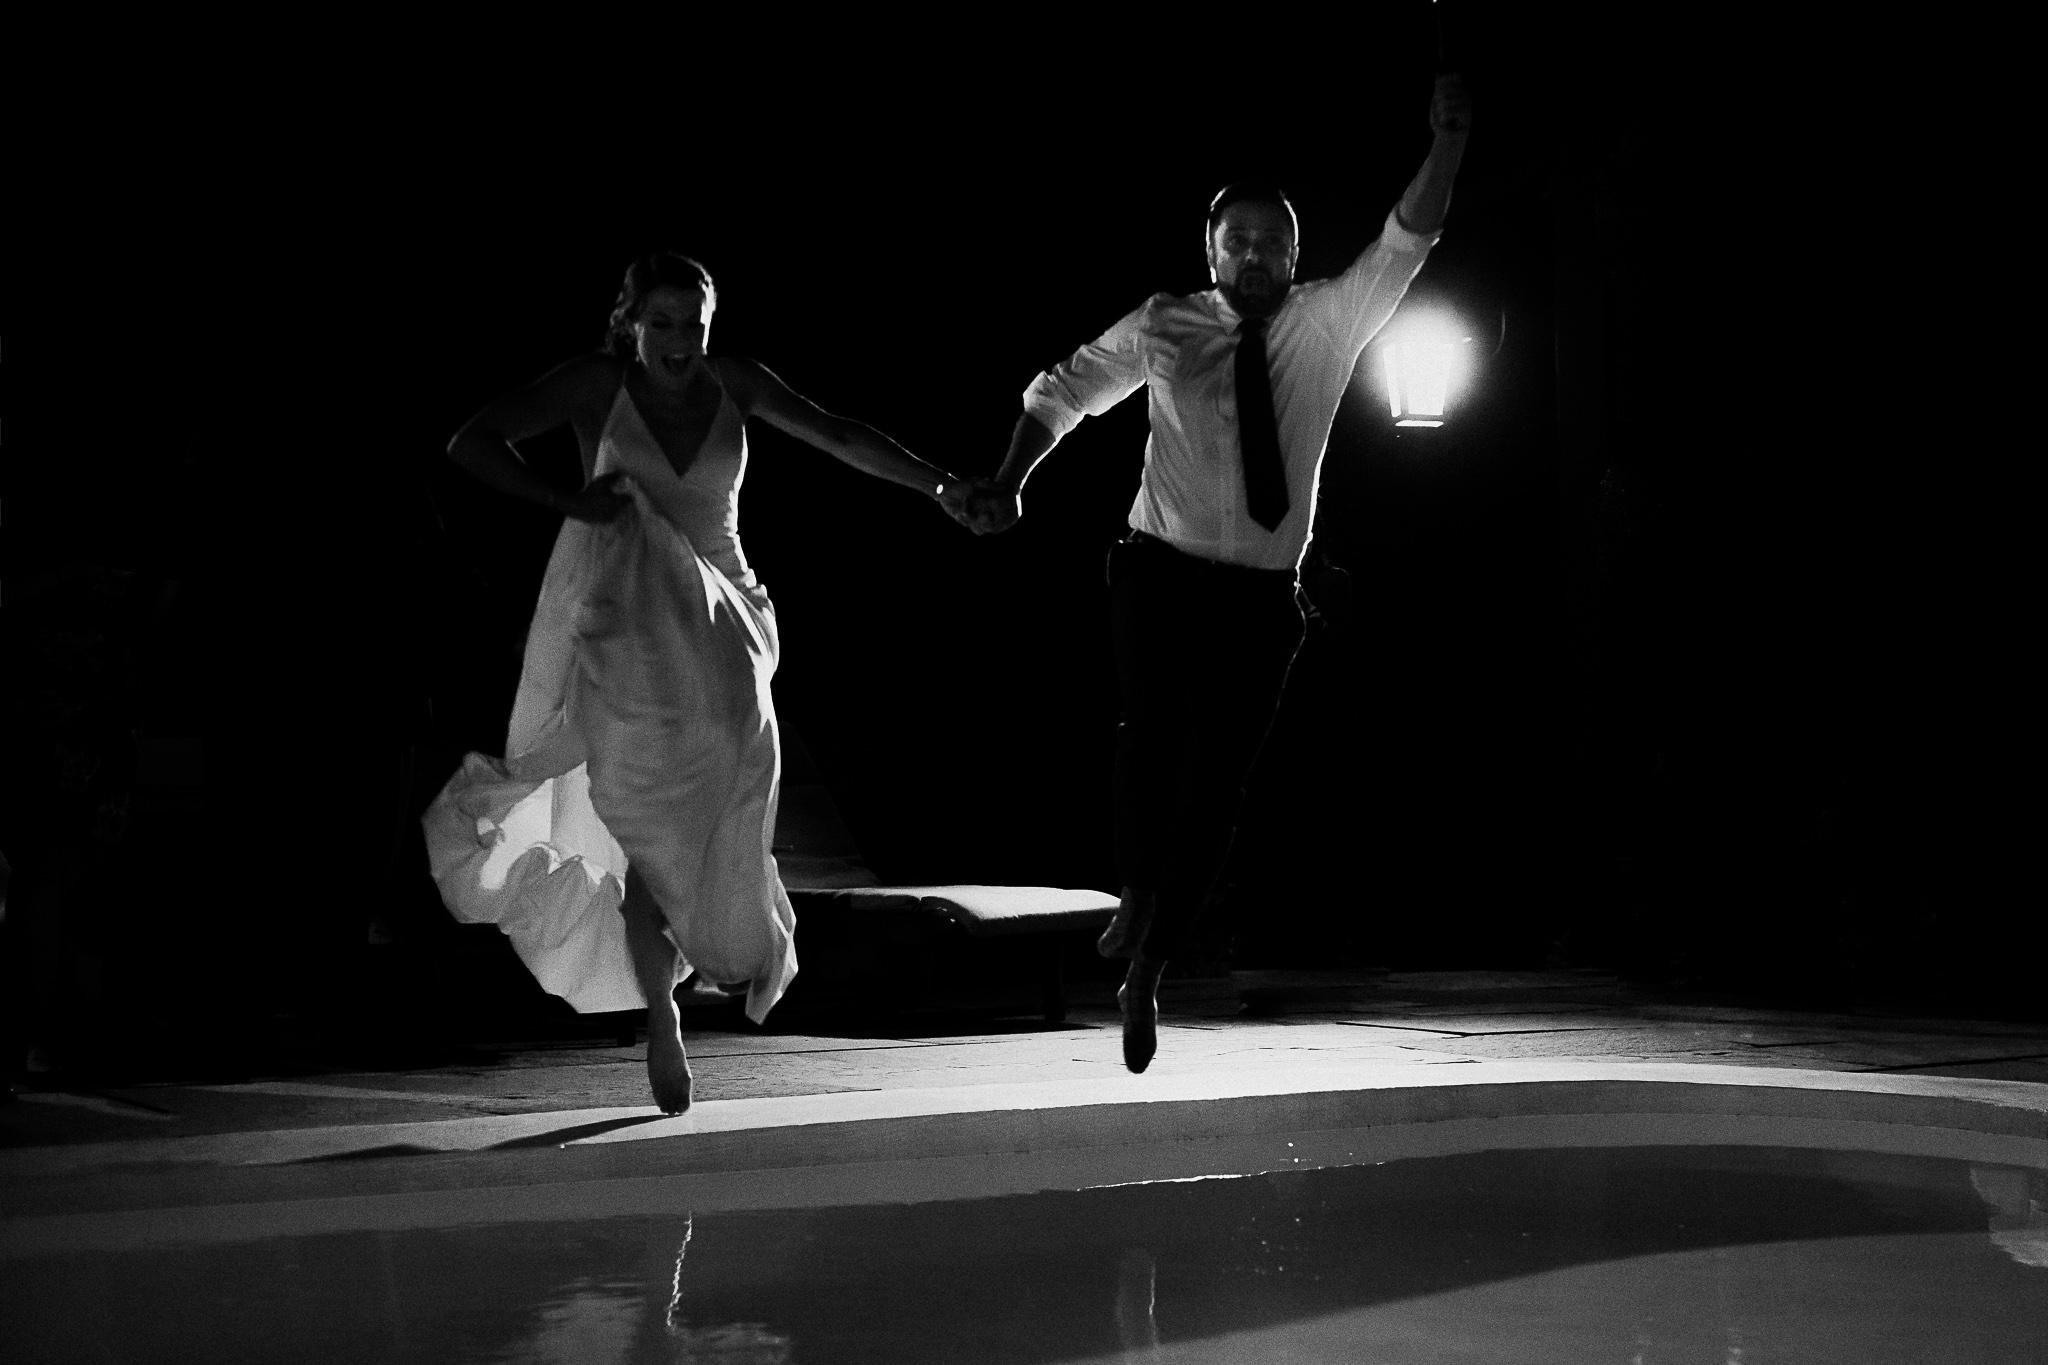 vermont-wedding-photographers-summit-lodge-thewarmtharoundyou6.jpg